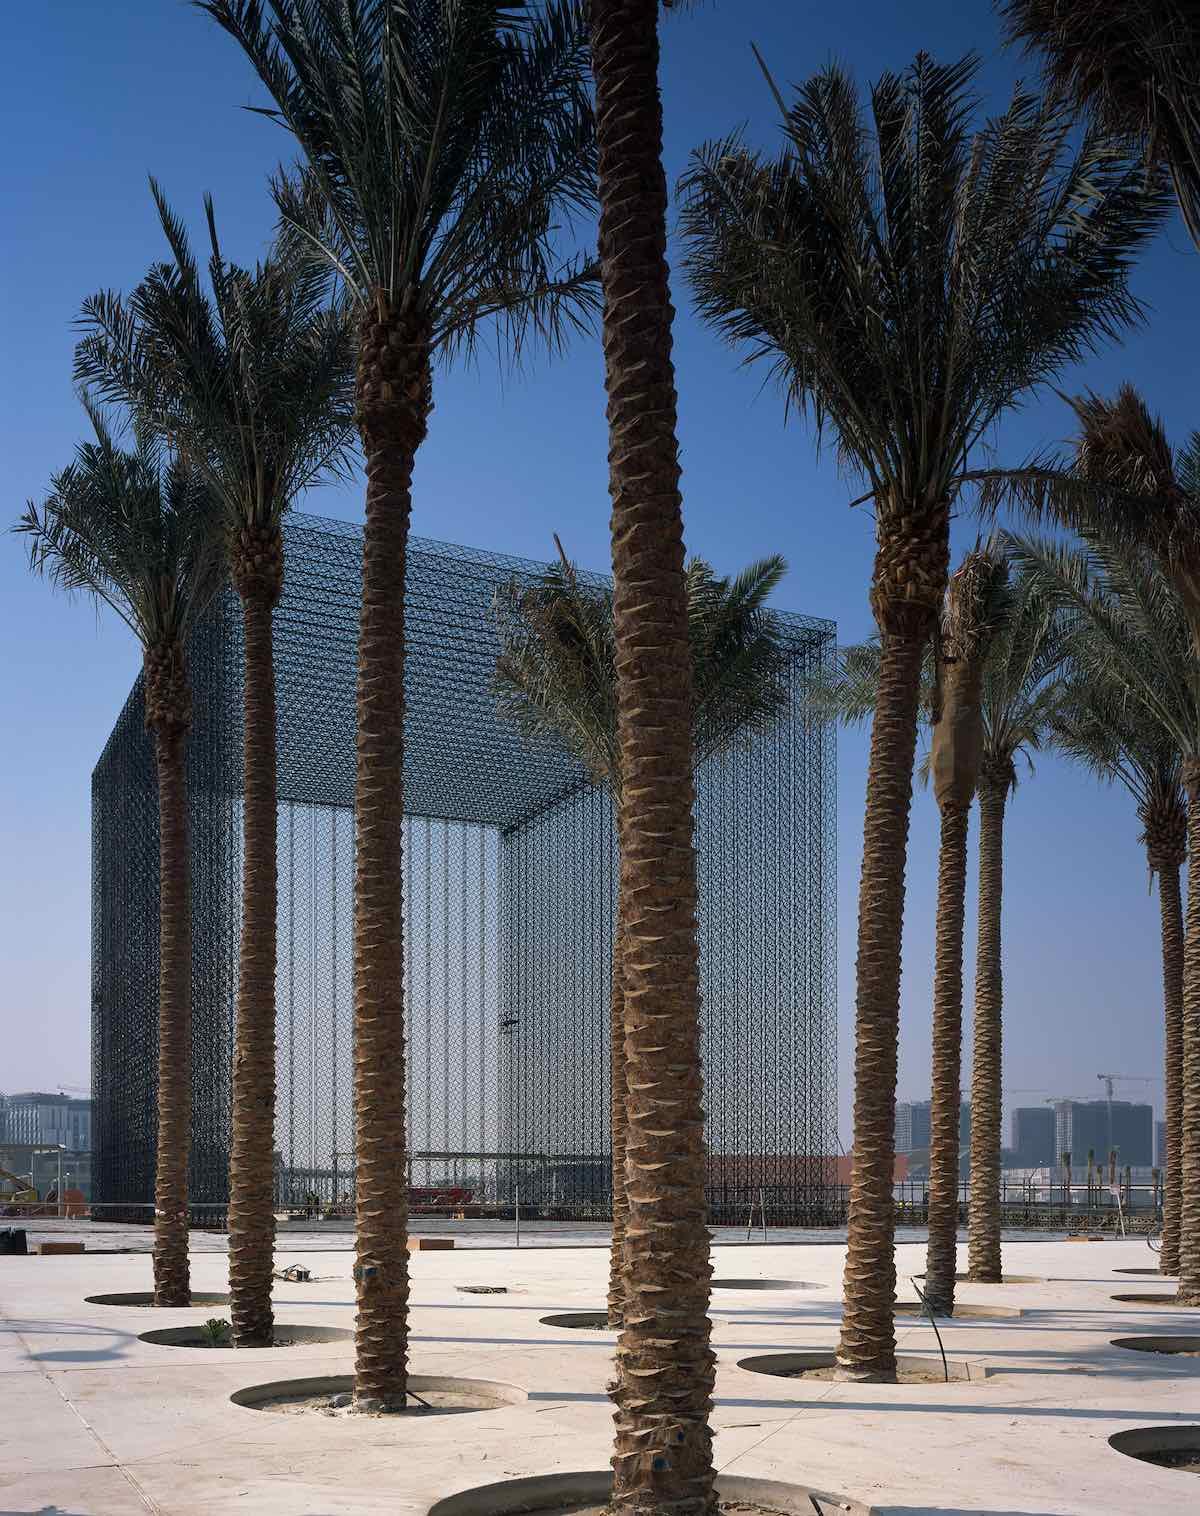 Asif Khan's ethereal portals for Expo 2020 Dubai - Photo by Helene Binet, courtesy of Asif Khan design studio.